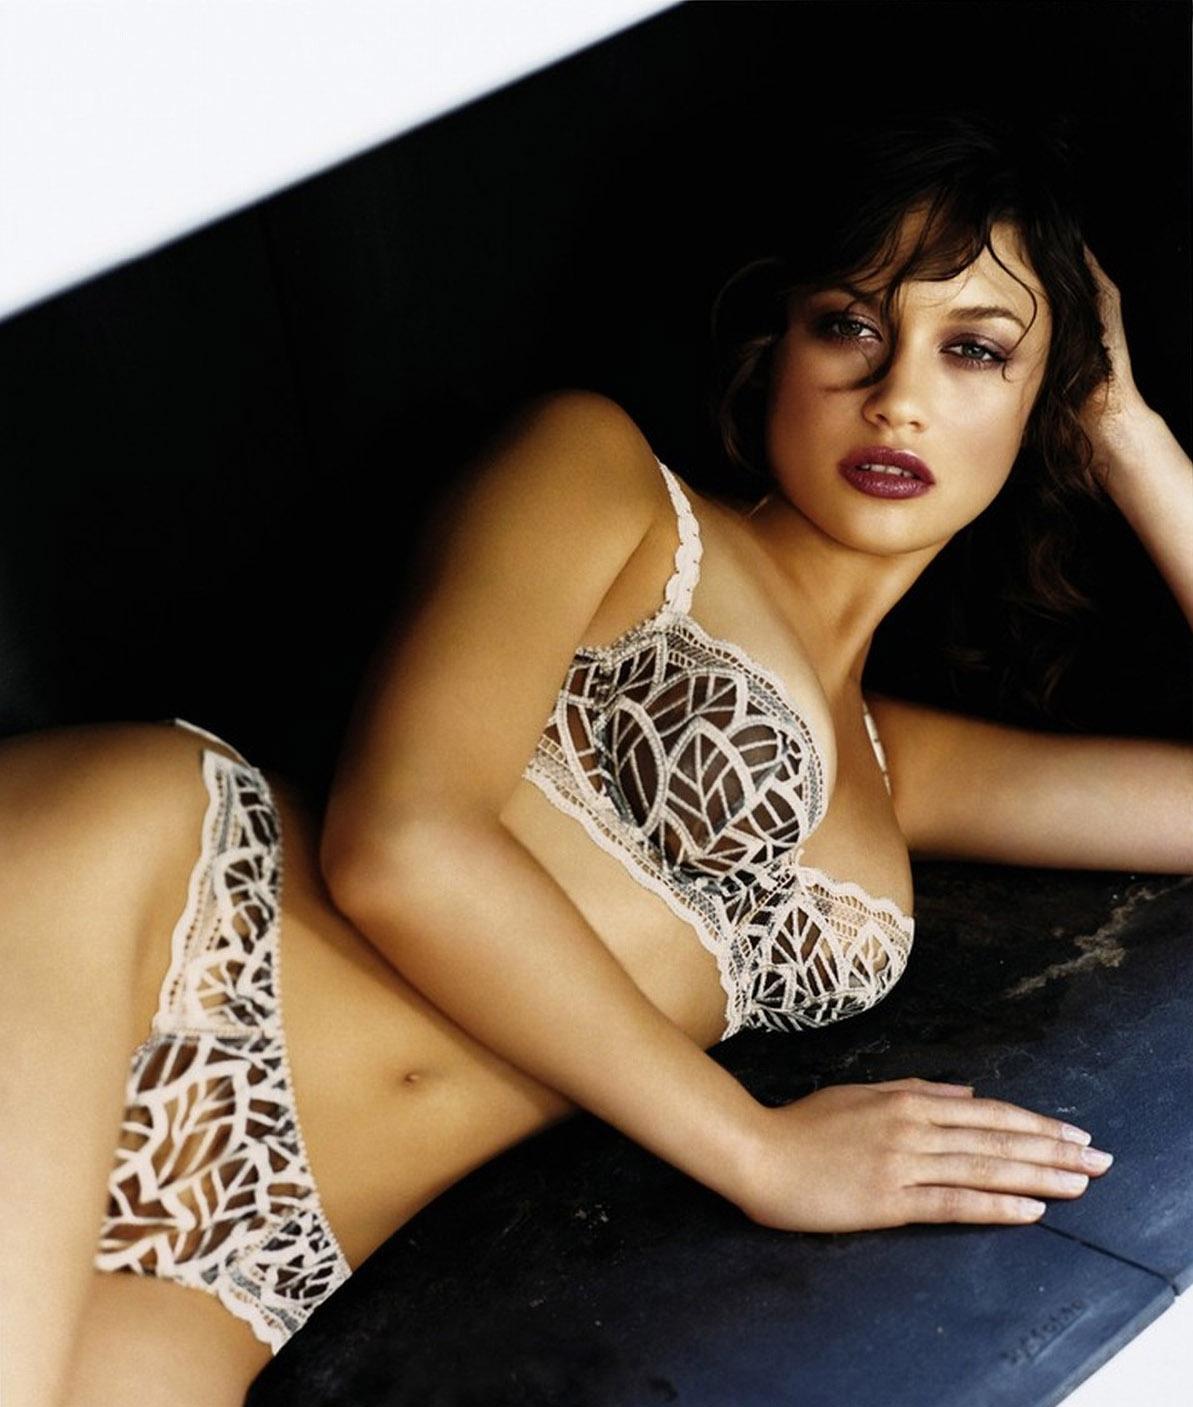 Sexy women Hot girls beautiful models and Celebrities